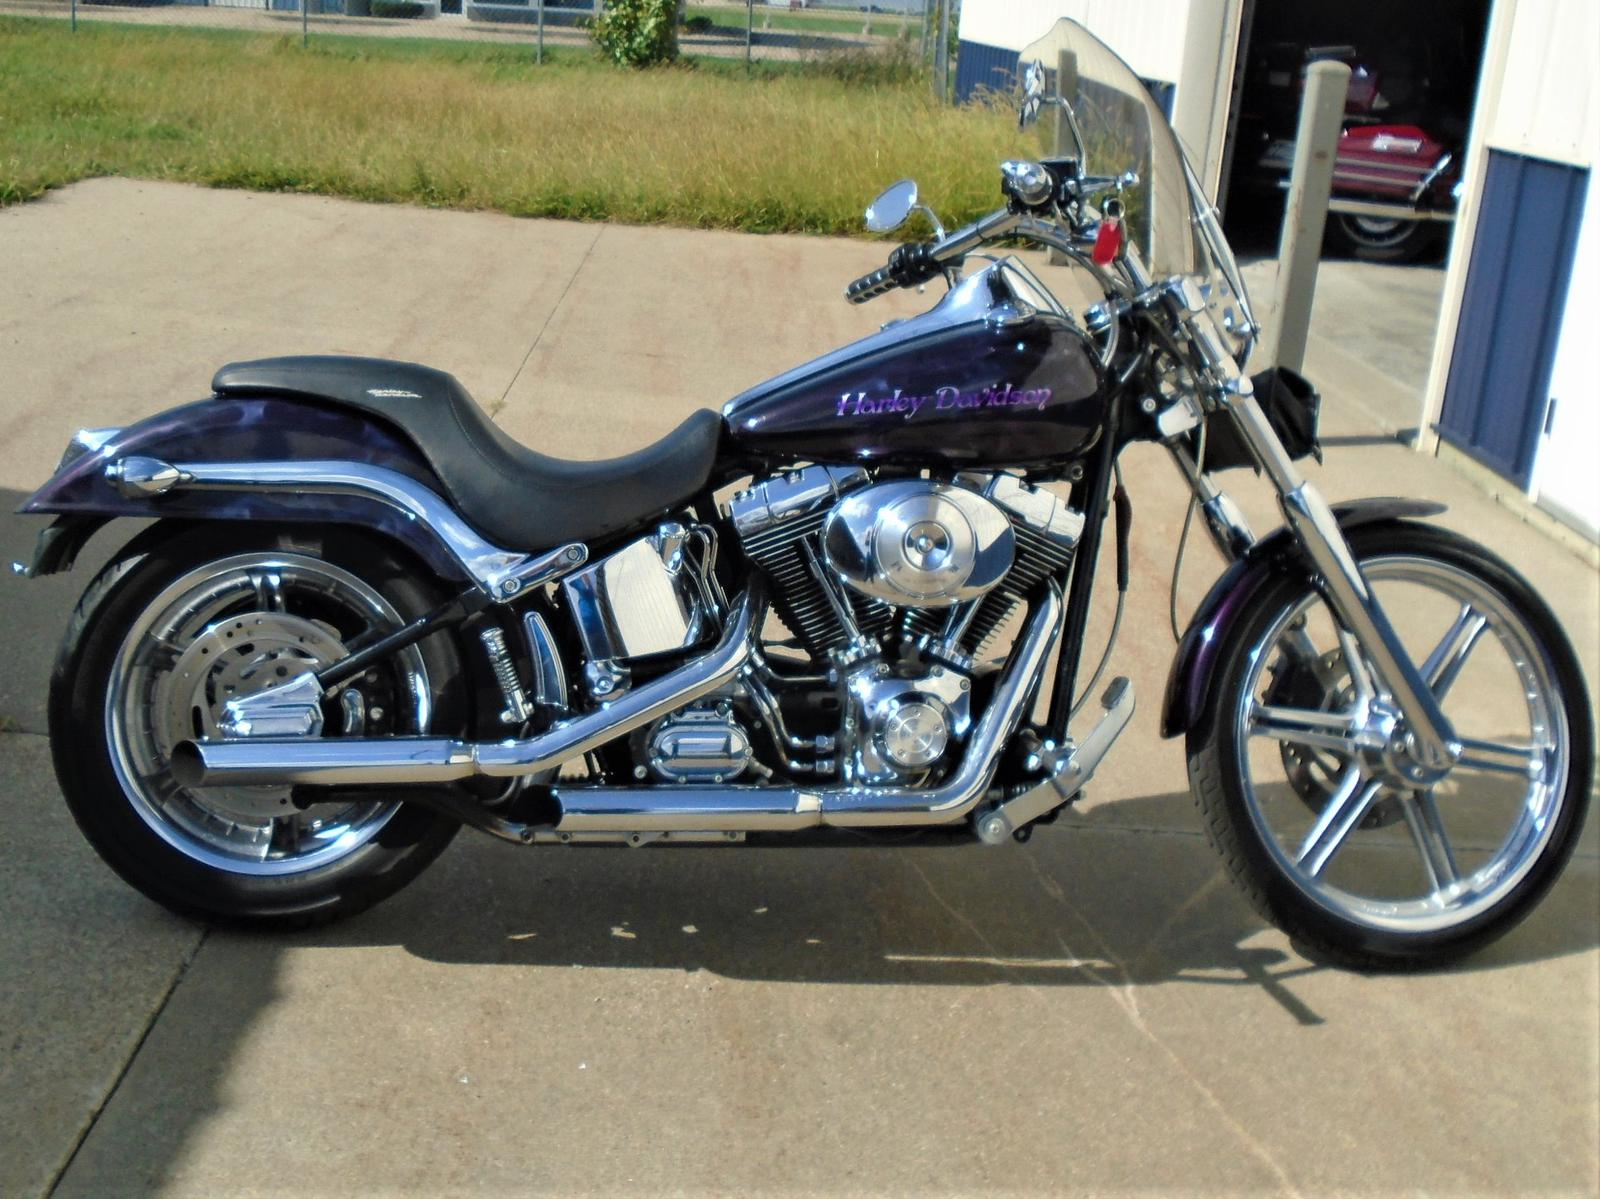 Harley Davidson Deuce >> 2000 Harley Davidson Fxstd Softail Deuce For Sale In Chariton Ia